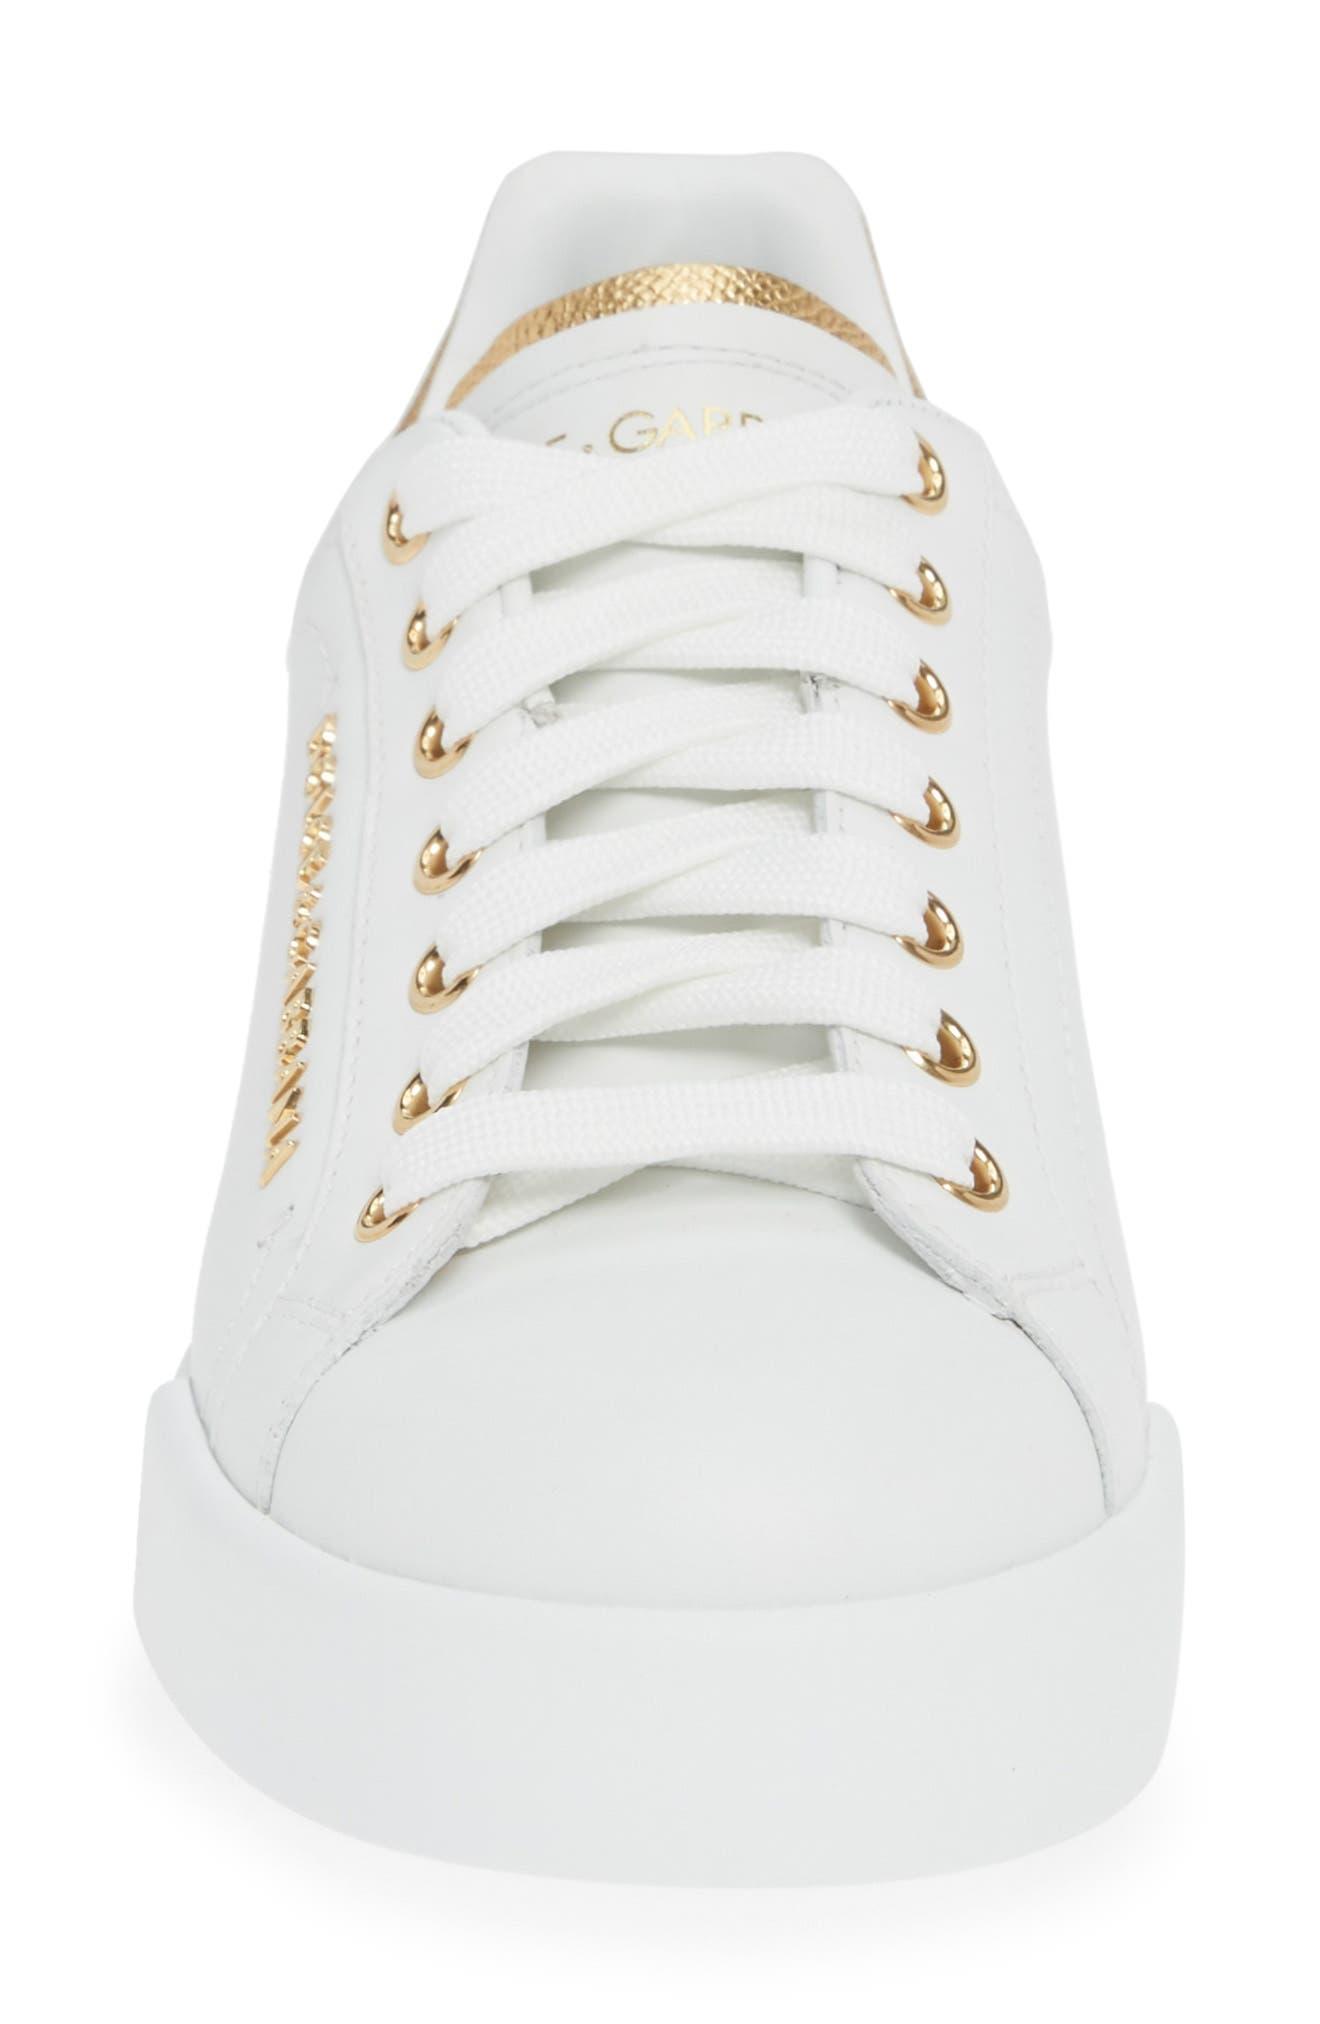 DOLCE&GABBANA, Portofino Embellished Sneaker, Alternate thumbnail 4, color, WHITE/ GOLD